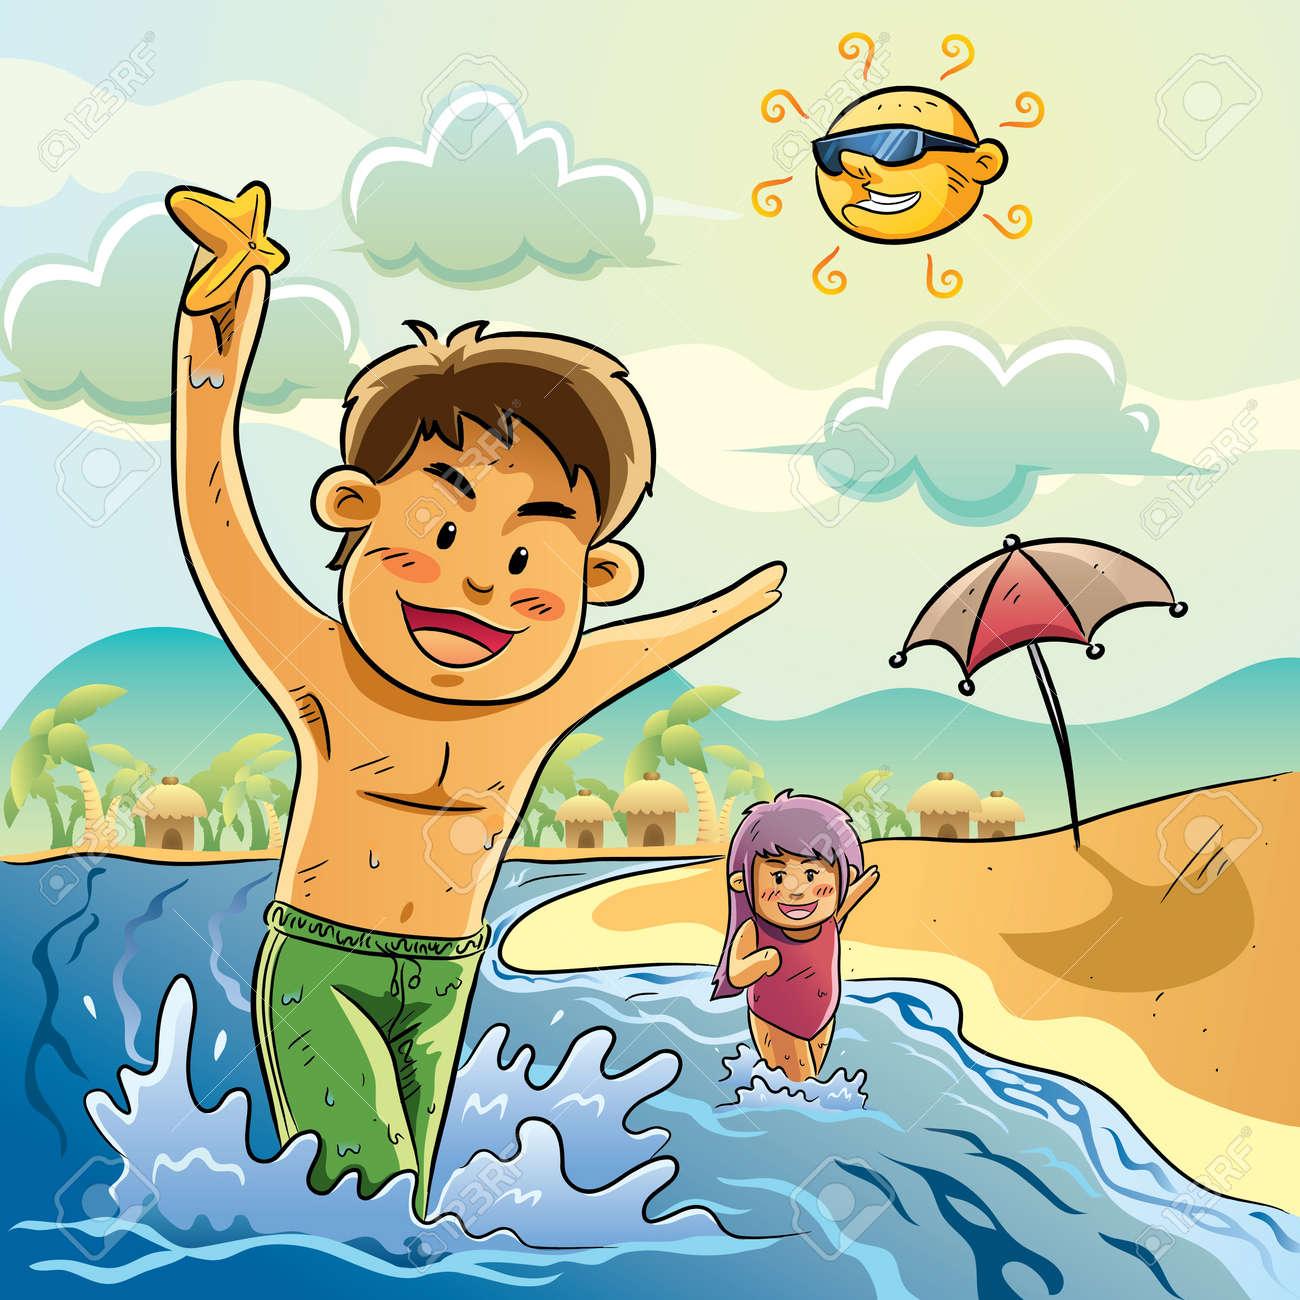 Kids Play On The Beach Stock Vector - 11068277